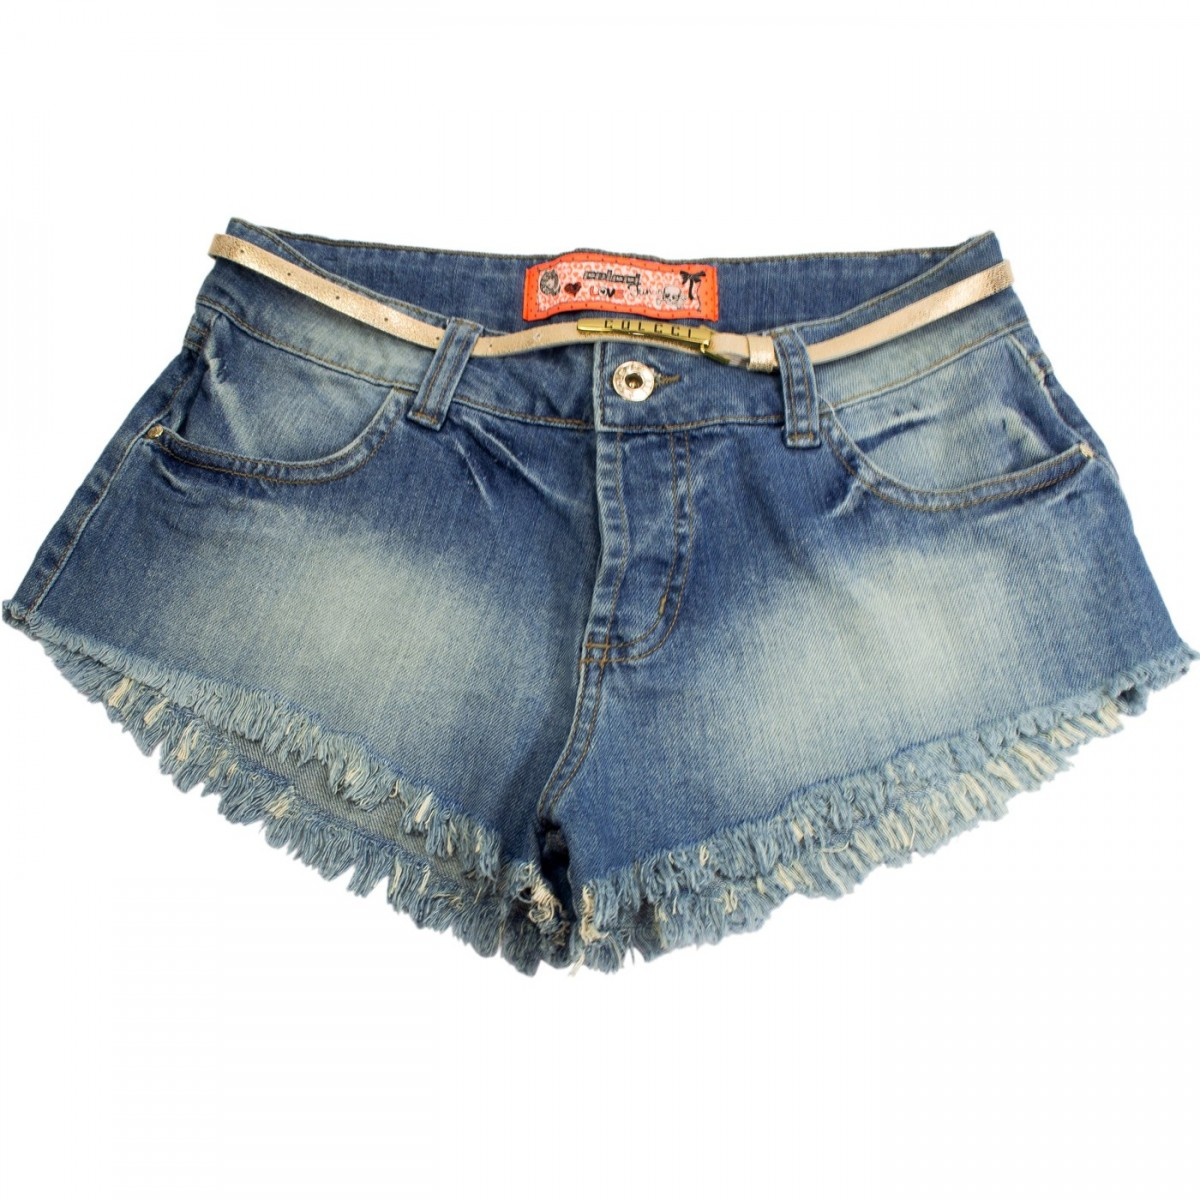 e6a053d5b Bizz Store - Shorts Jeans Juvenil Feminino Colcci Fun Indigo